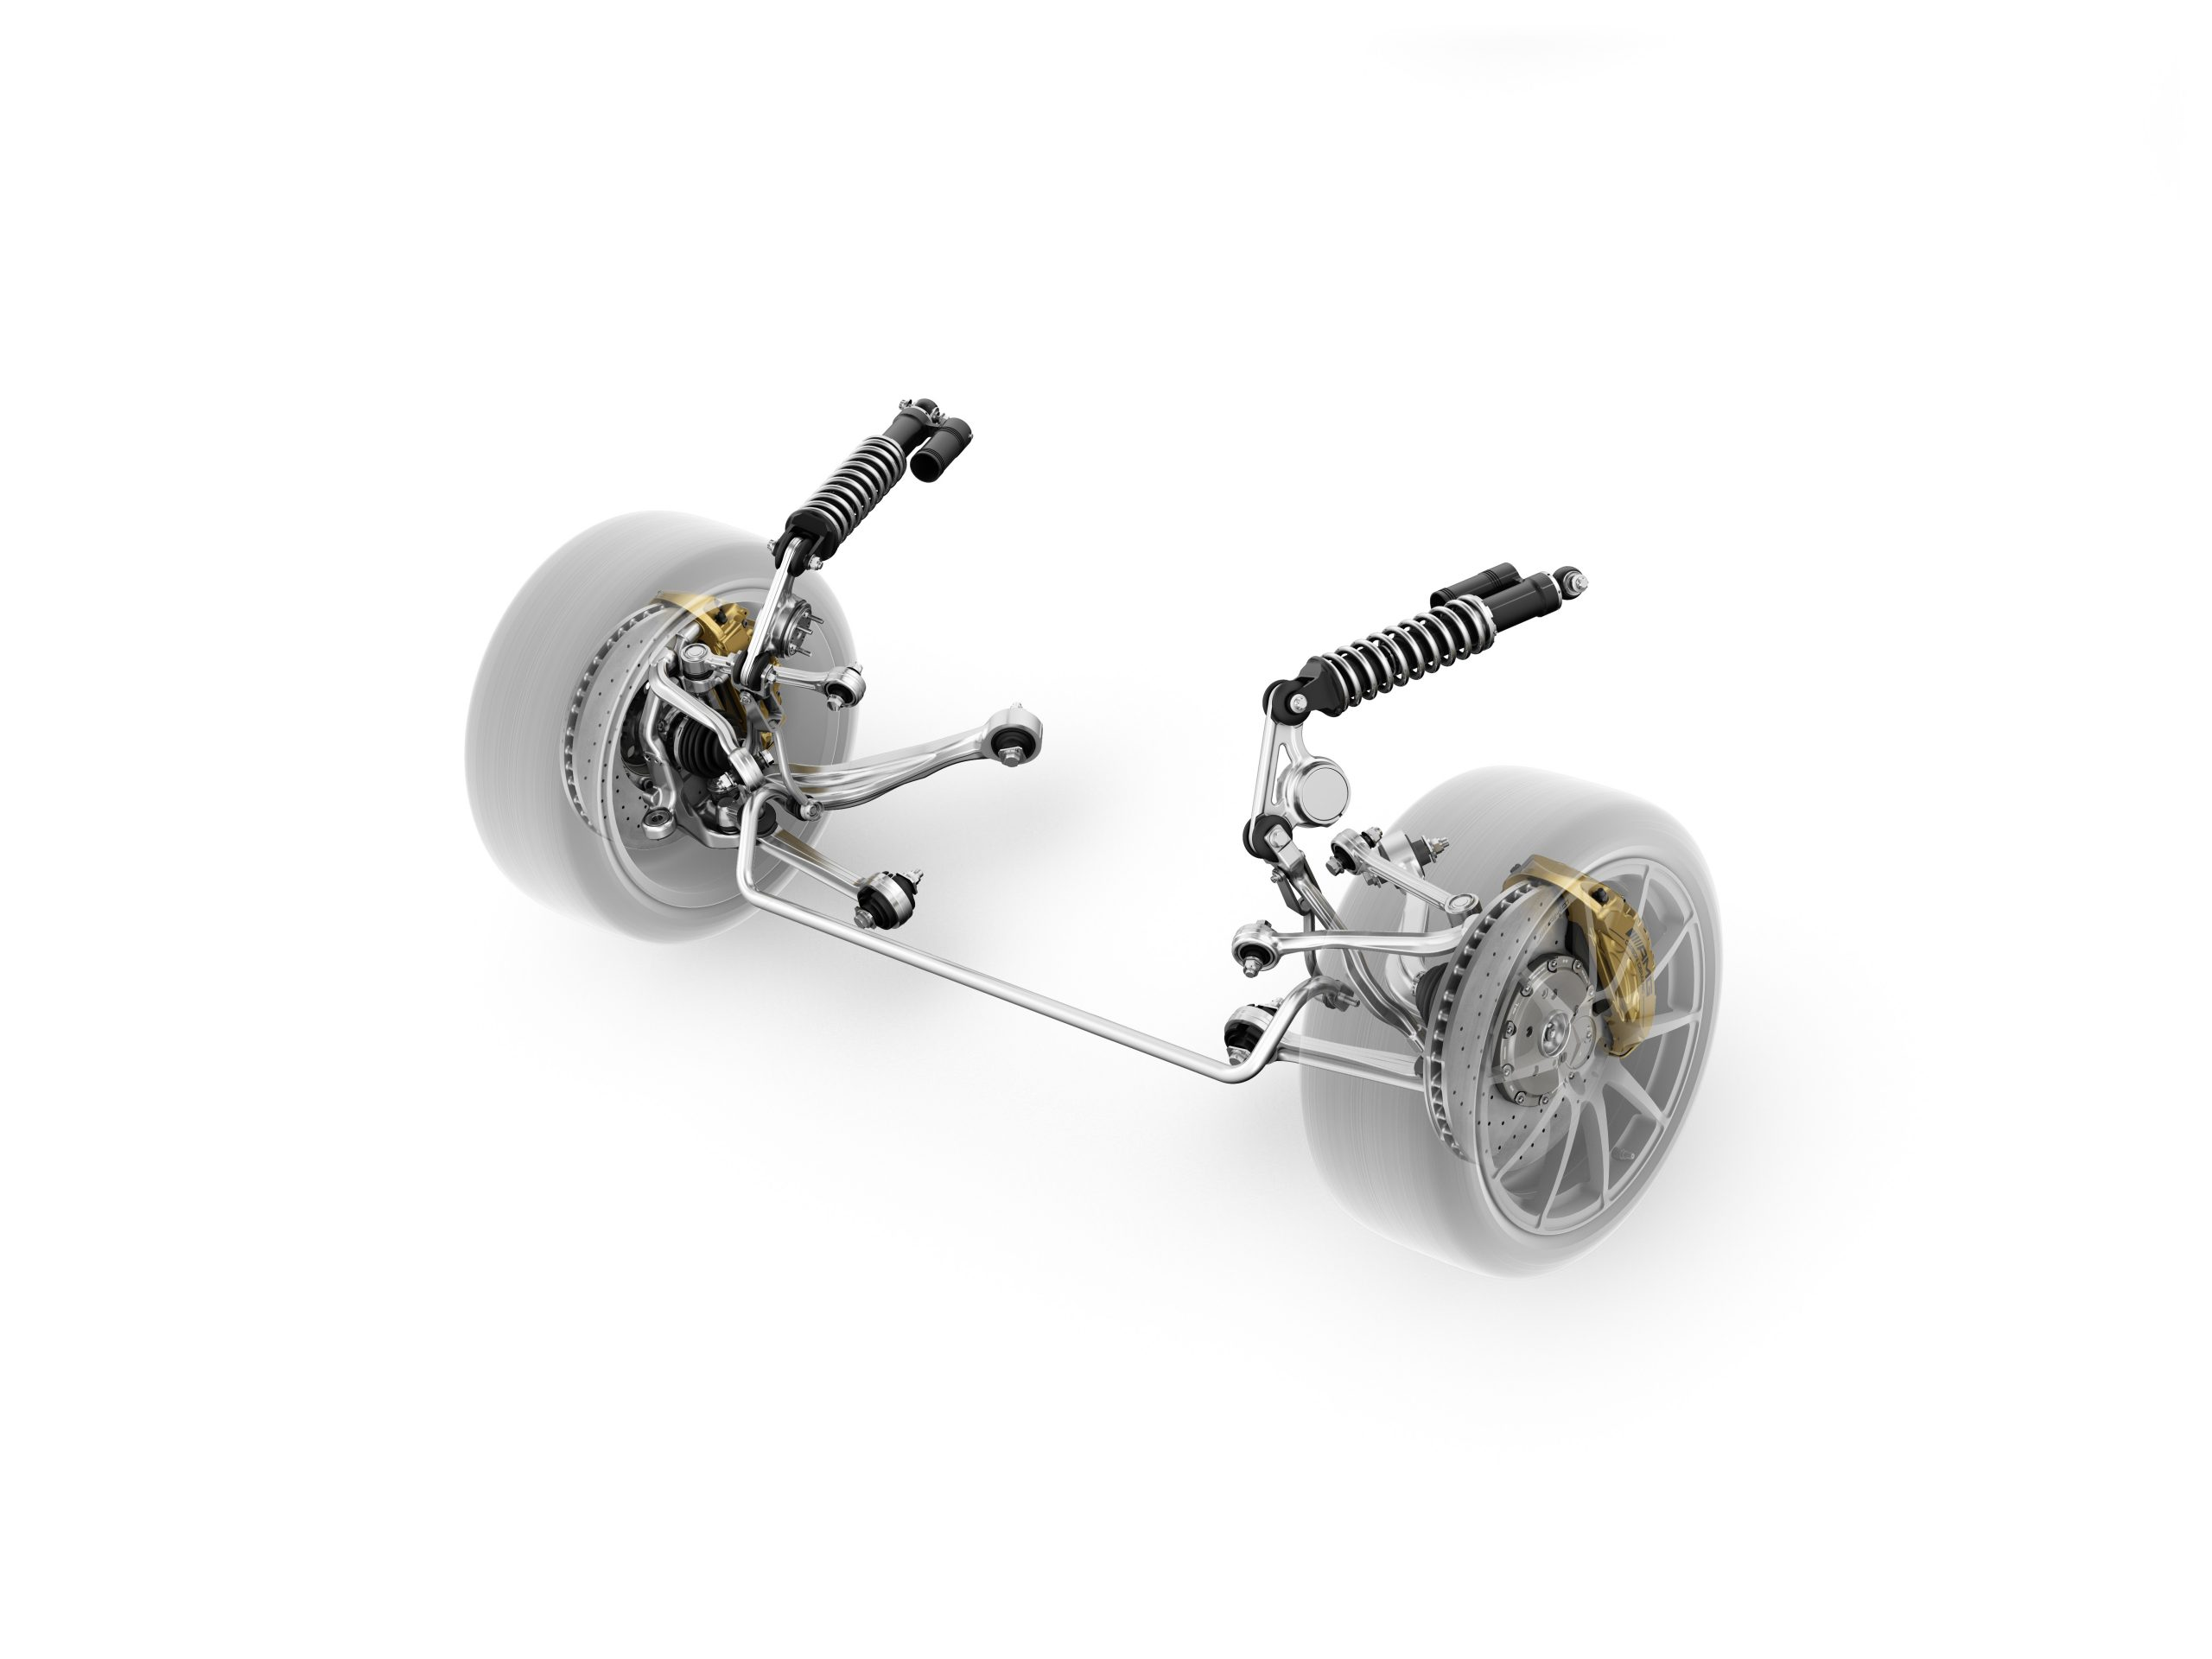 Mercedes-Benz SLS AMG E-CELL front suspension